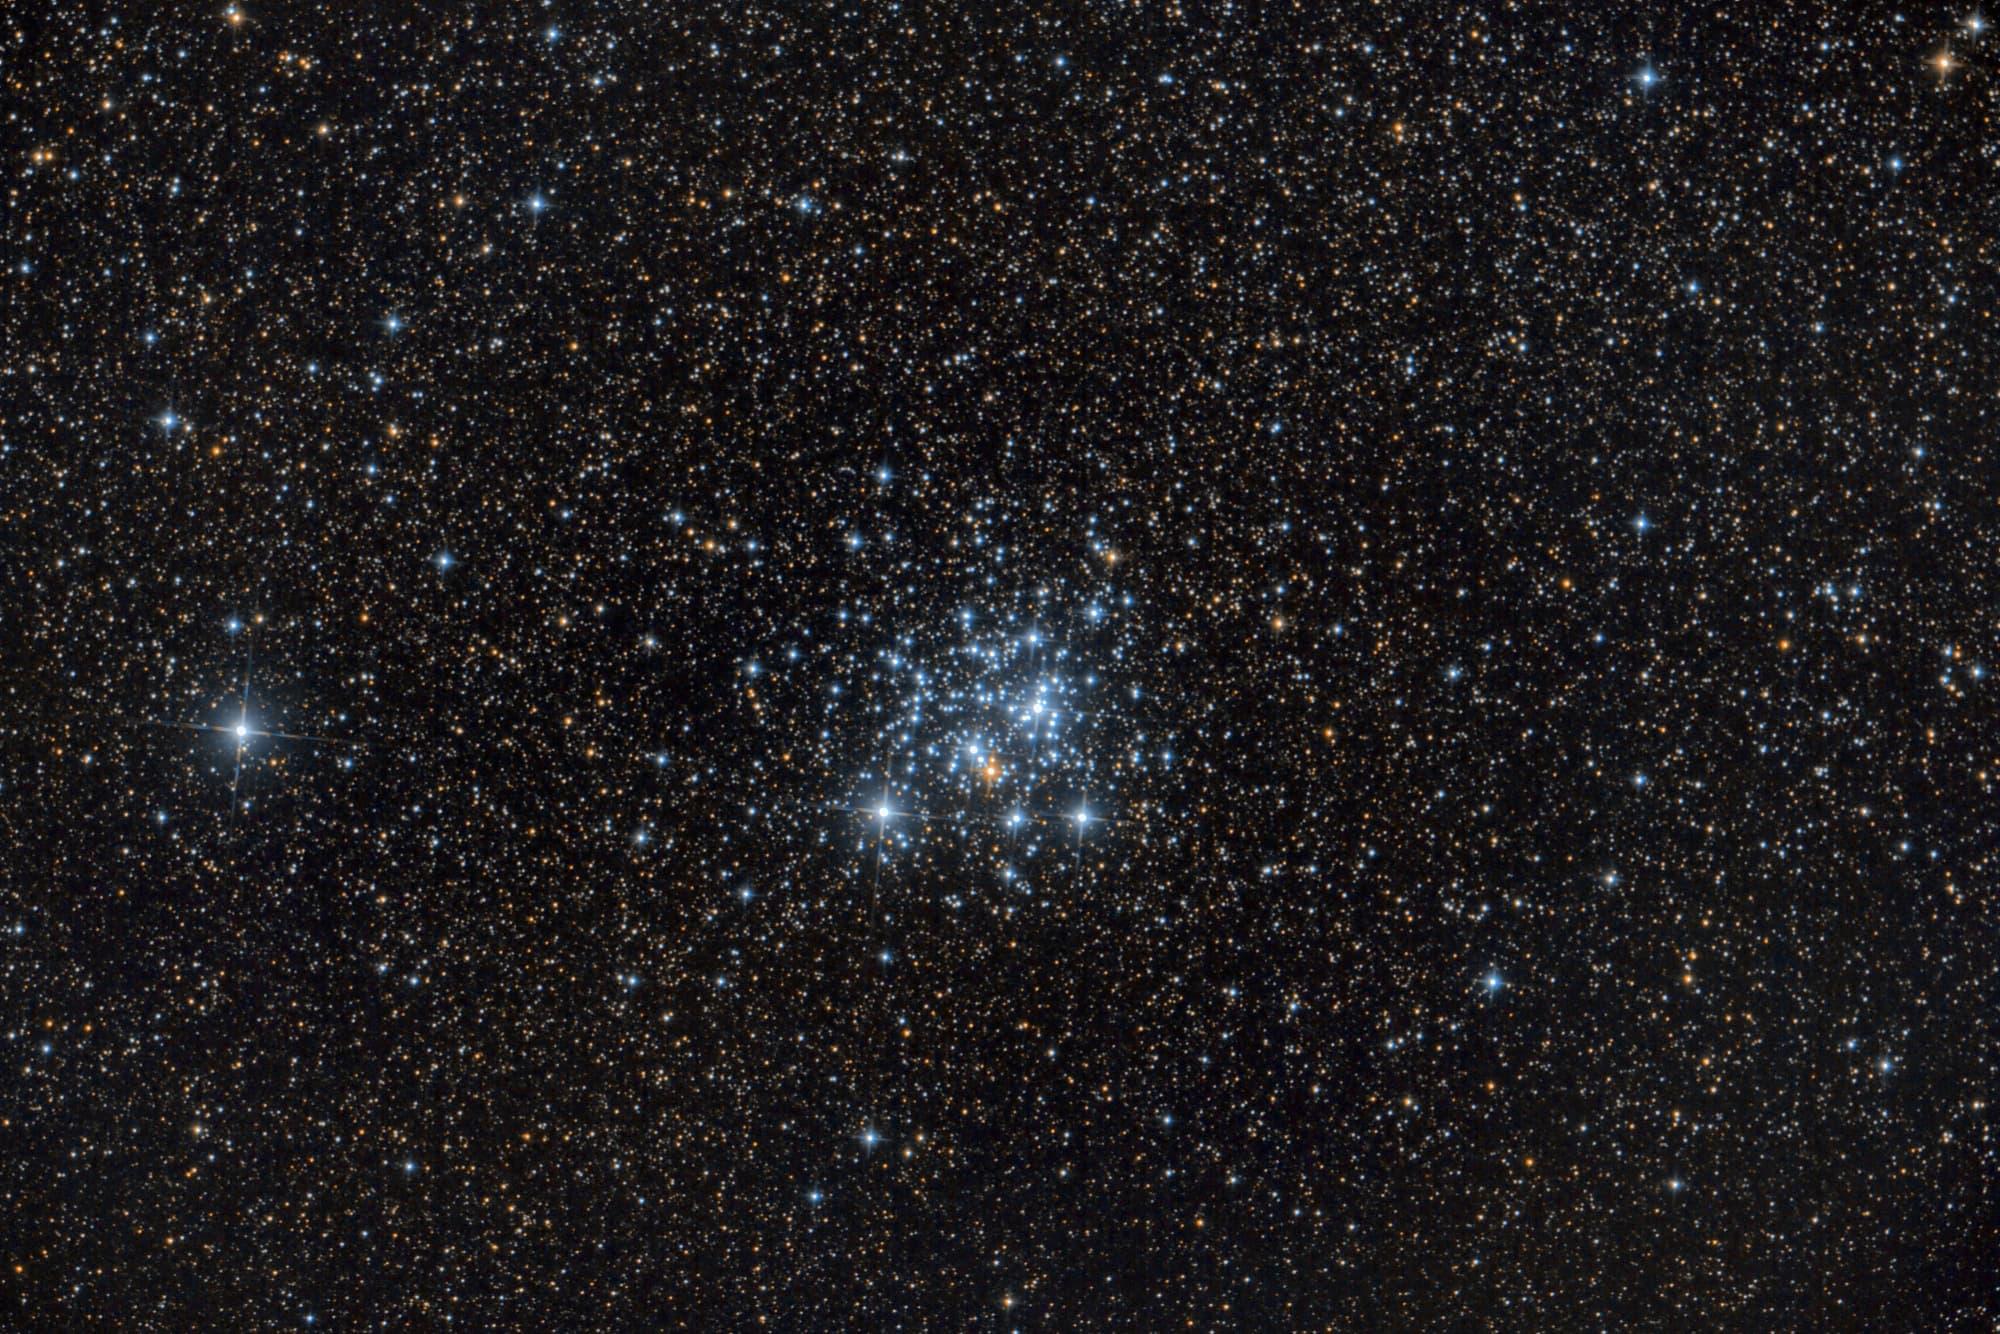 NGC4755 - Schmuckkästchen